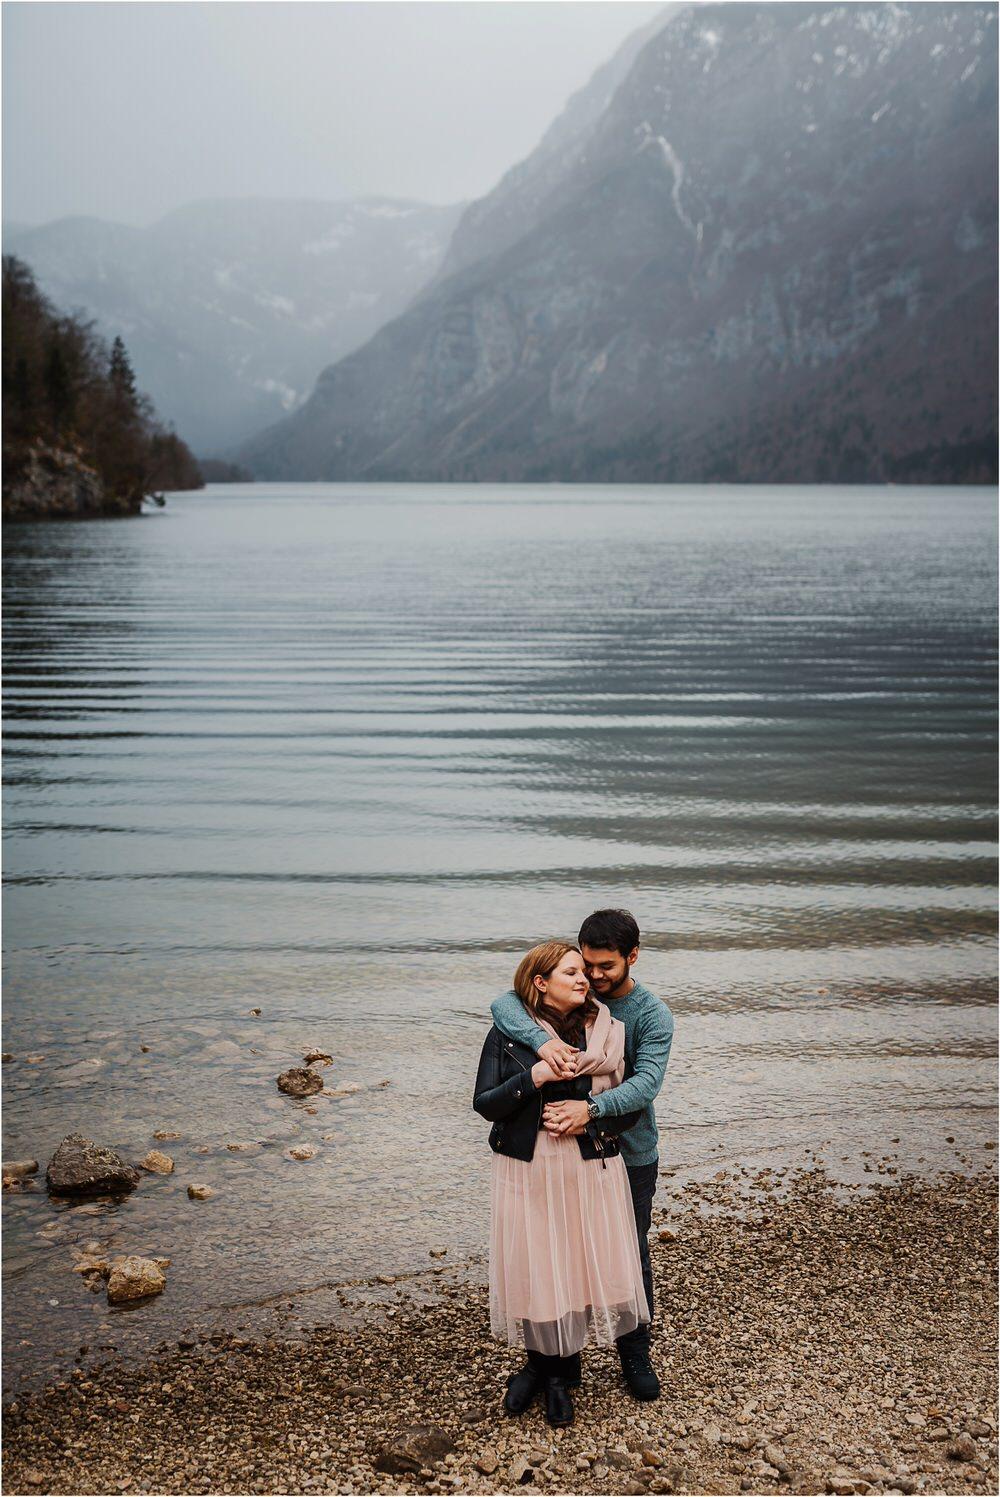 lake bohinj engagement photographer slovenia zaroka bohinjsko jezero fotografiranje bohinj slovenija naravno timeless 0014.jpg